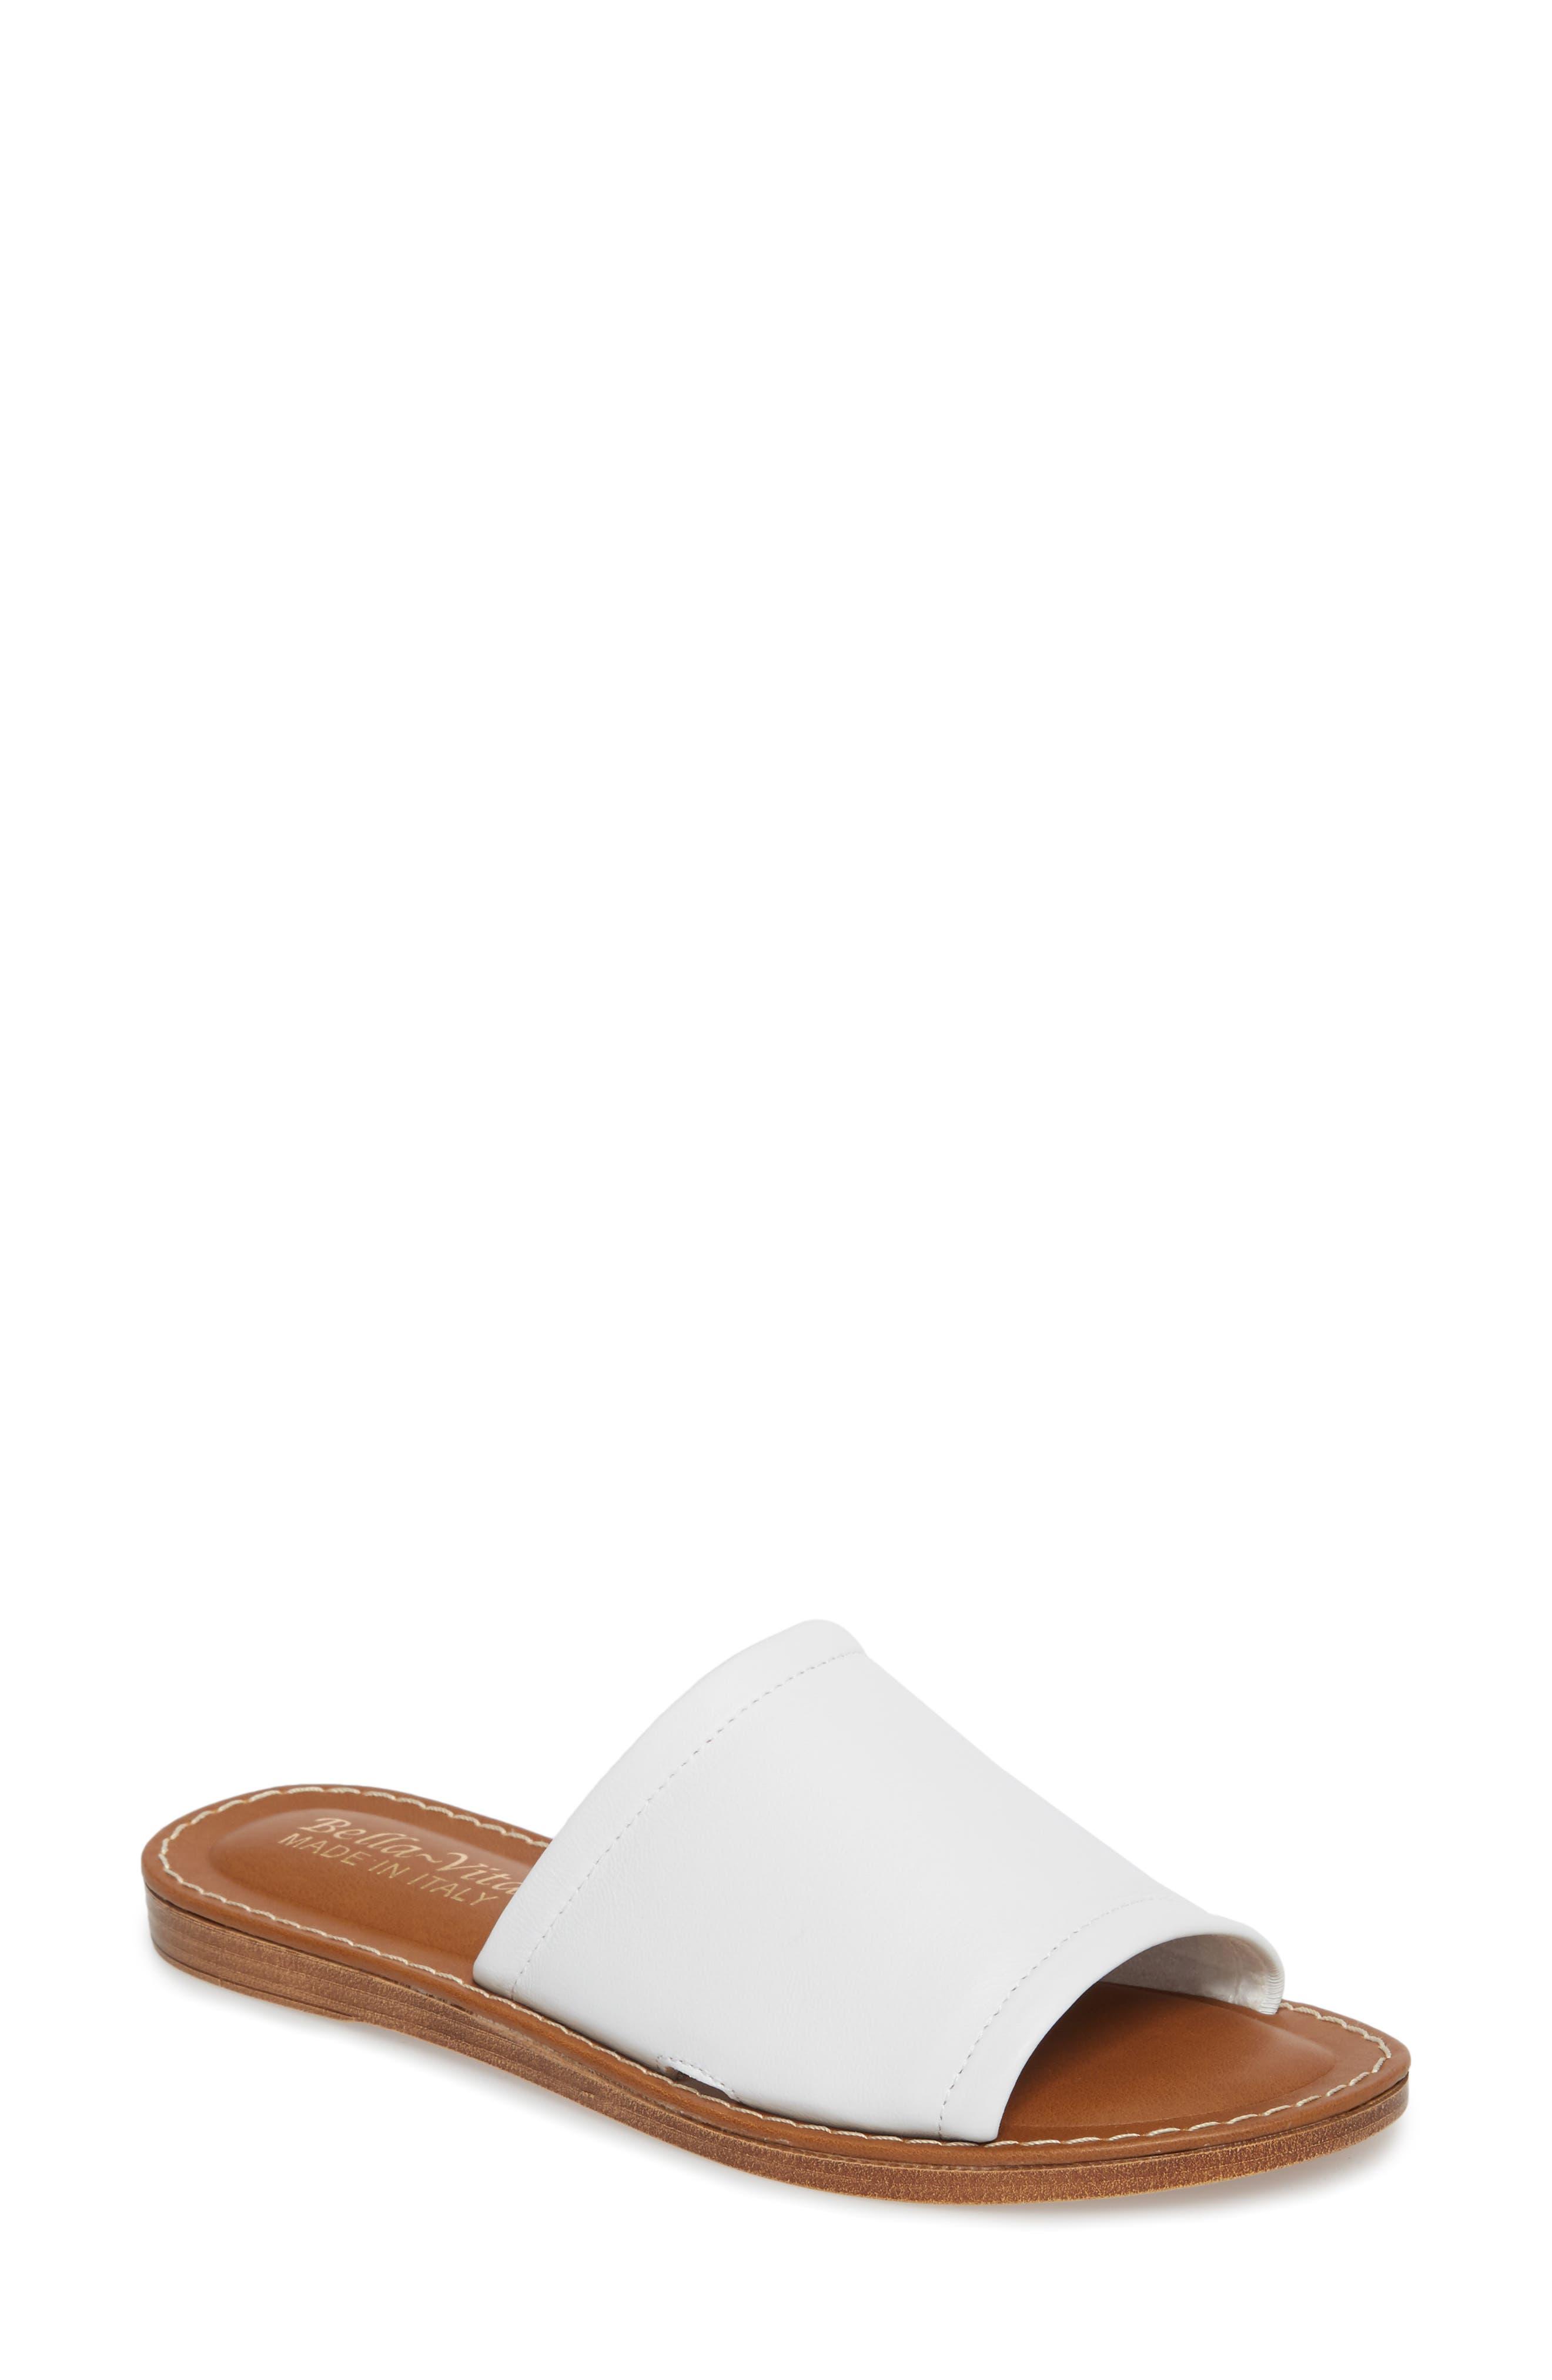 BELLA VITA Ros Slide Sandal, Main, color, WHITE LEATHER